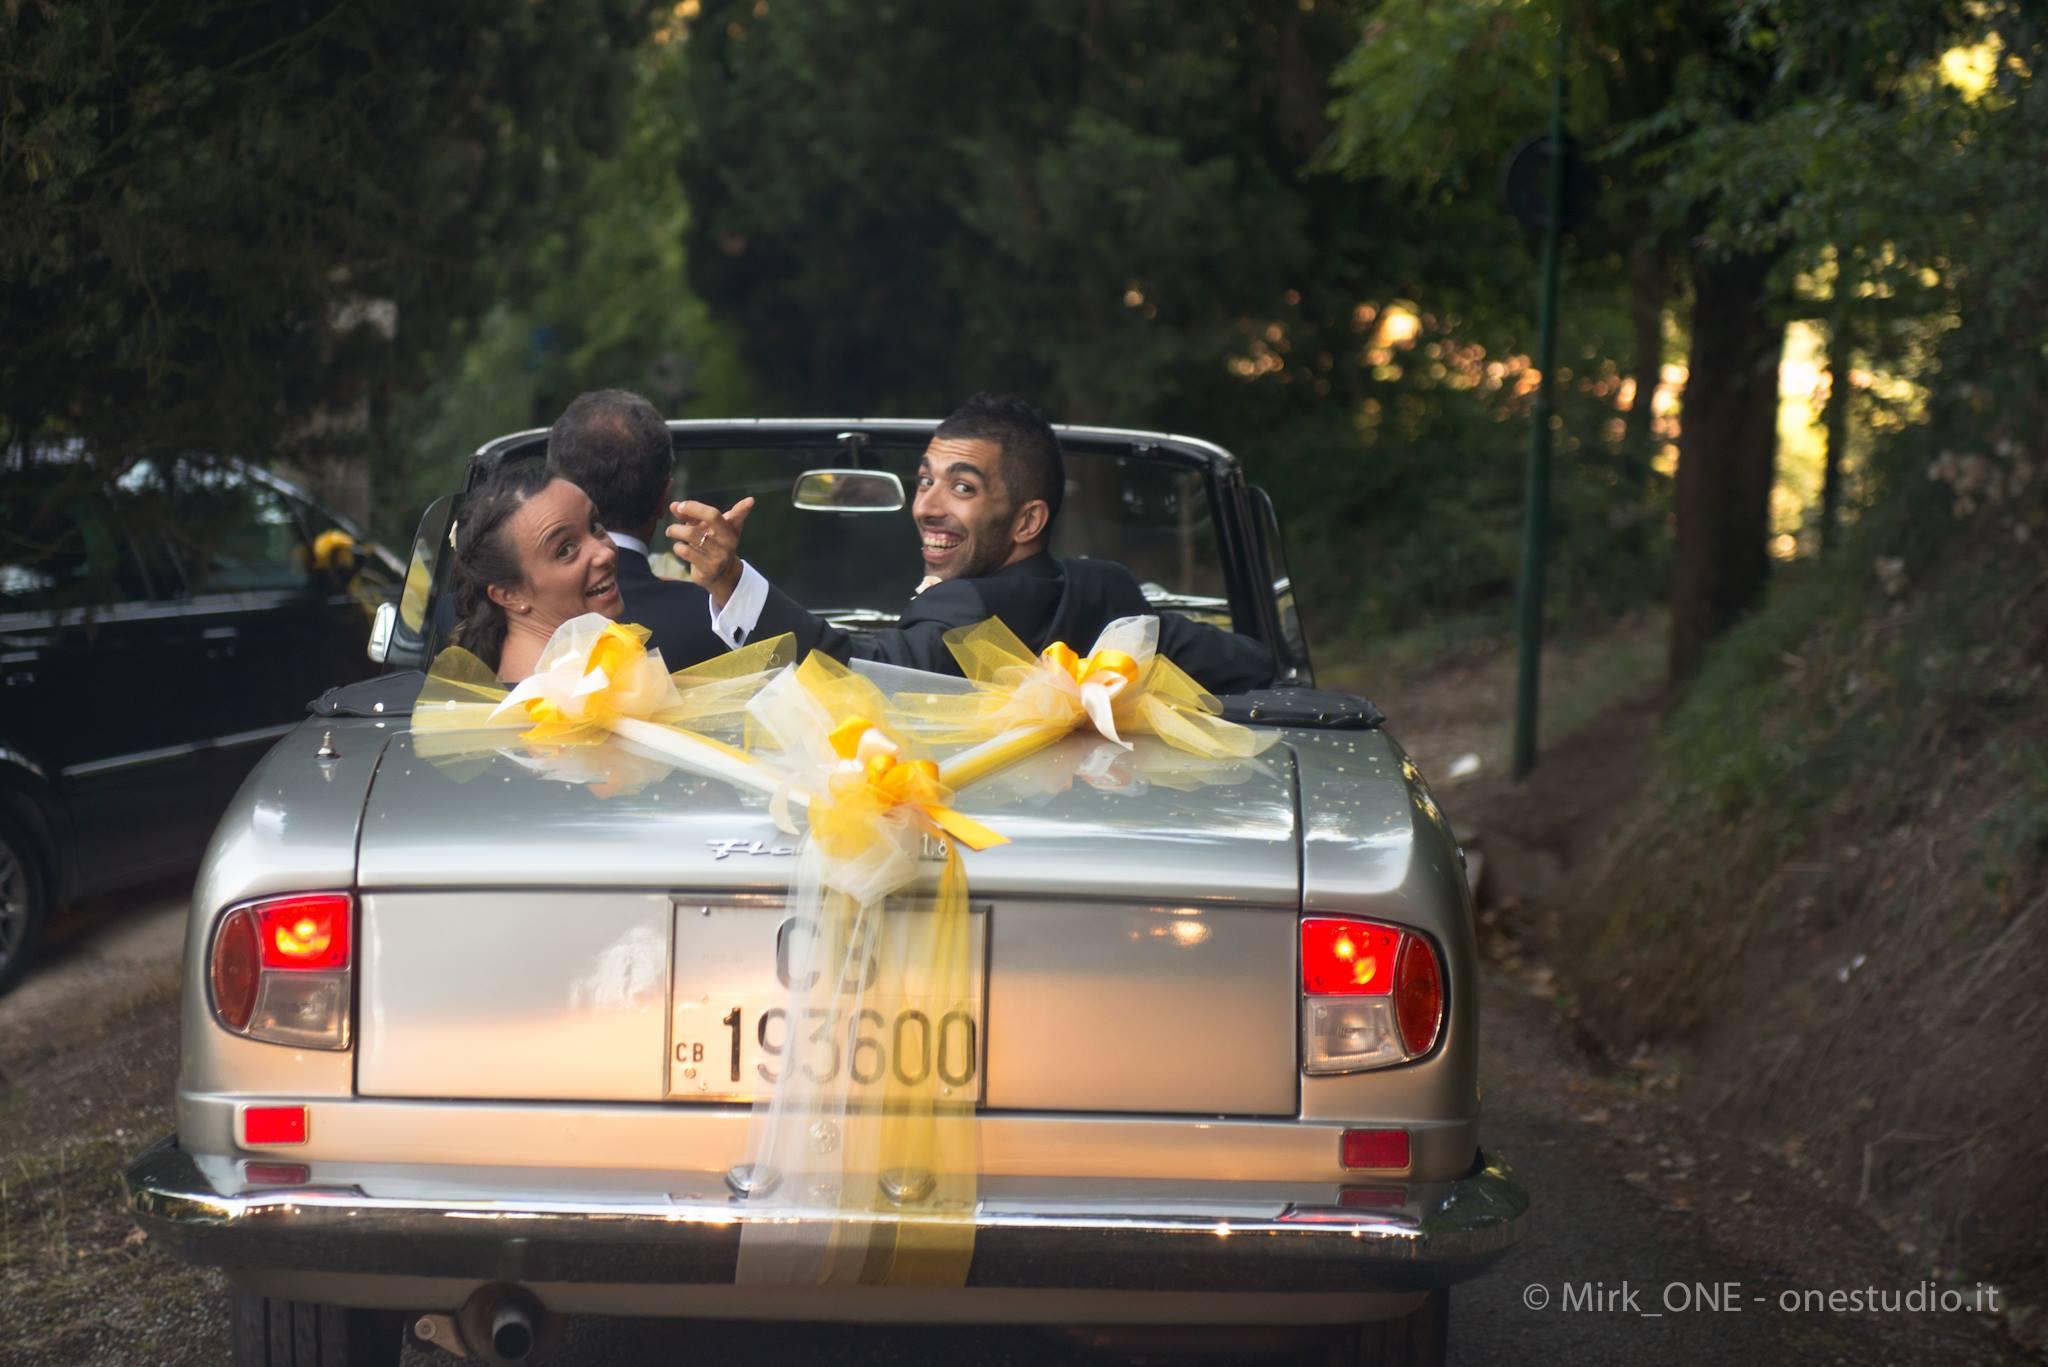 https://lnx.mirkone.it/wp-content/uploads/2018/03/mirk_ONE-fotografo-matrimonio-00889.jpg